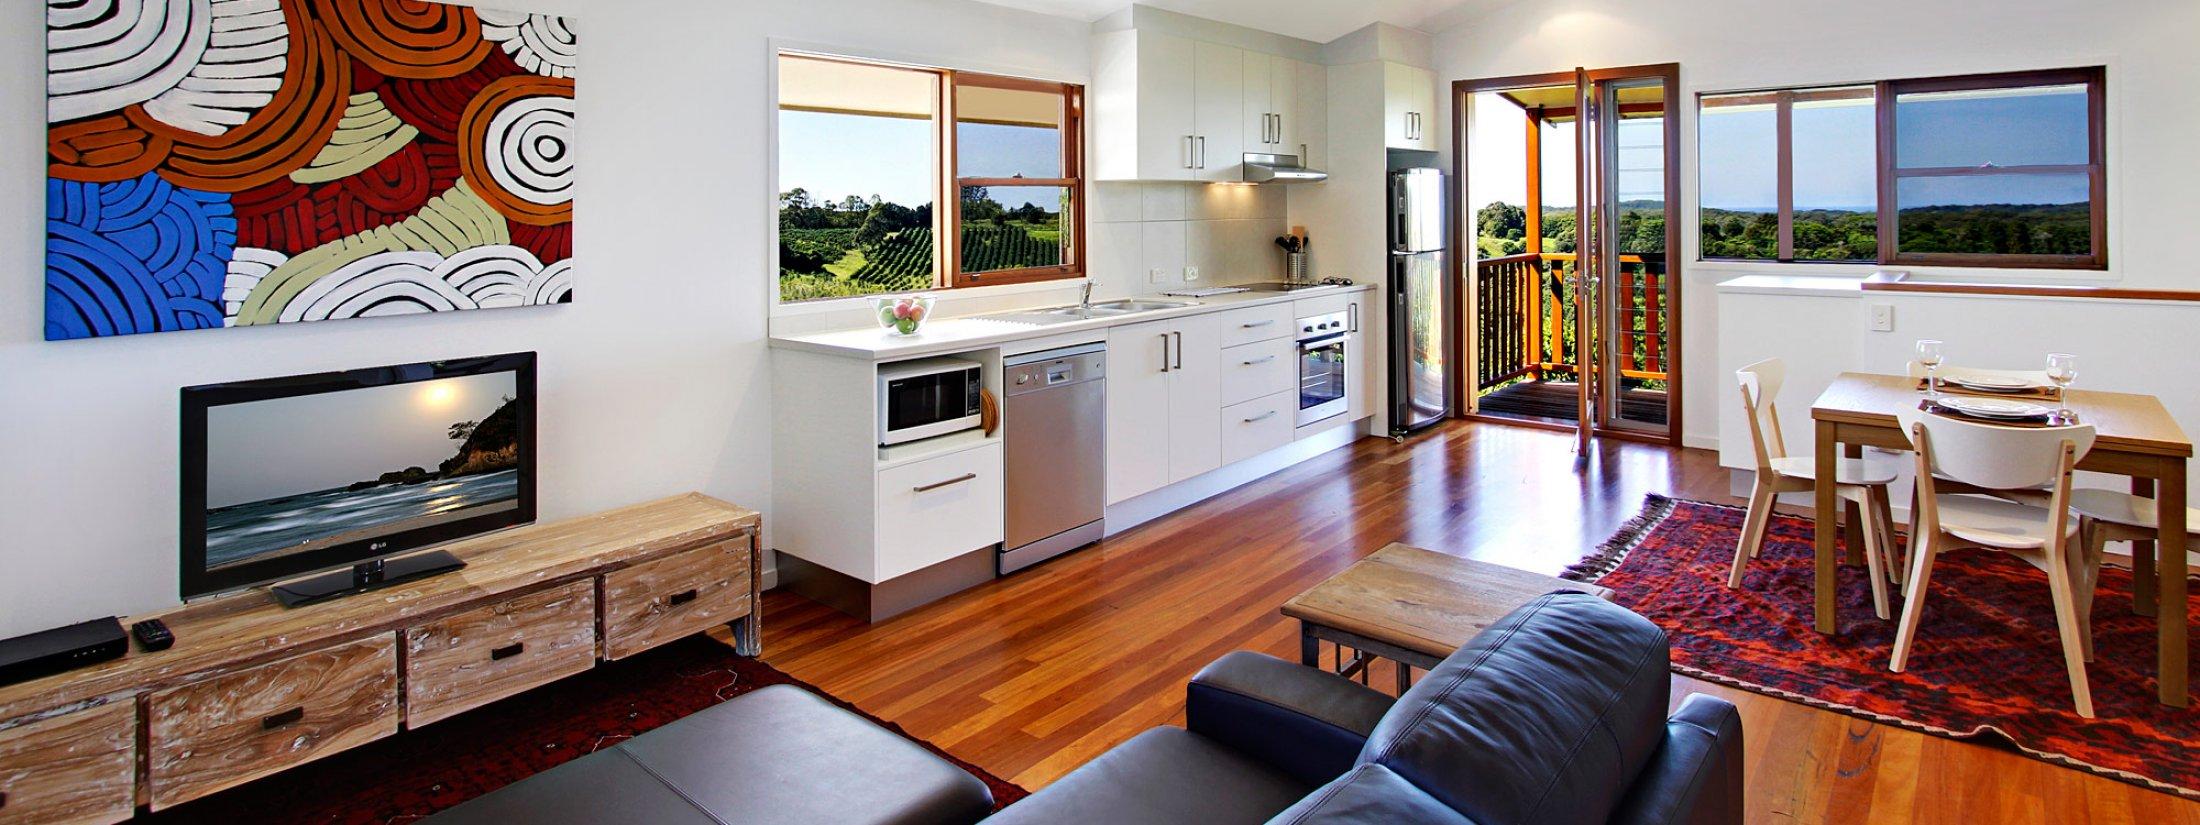 Aloha Ohana - Byron Bay - Living Kitchen and Dining